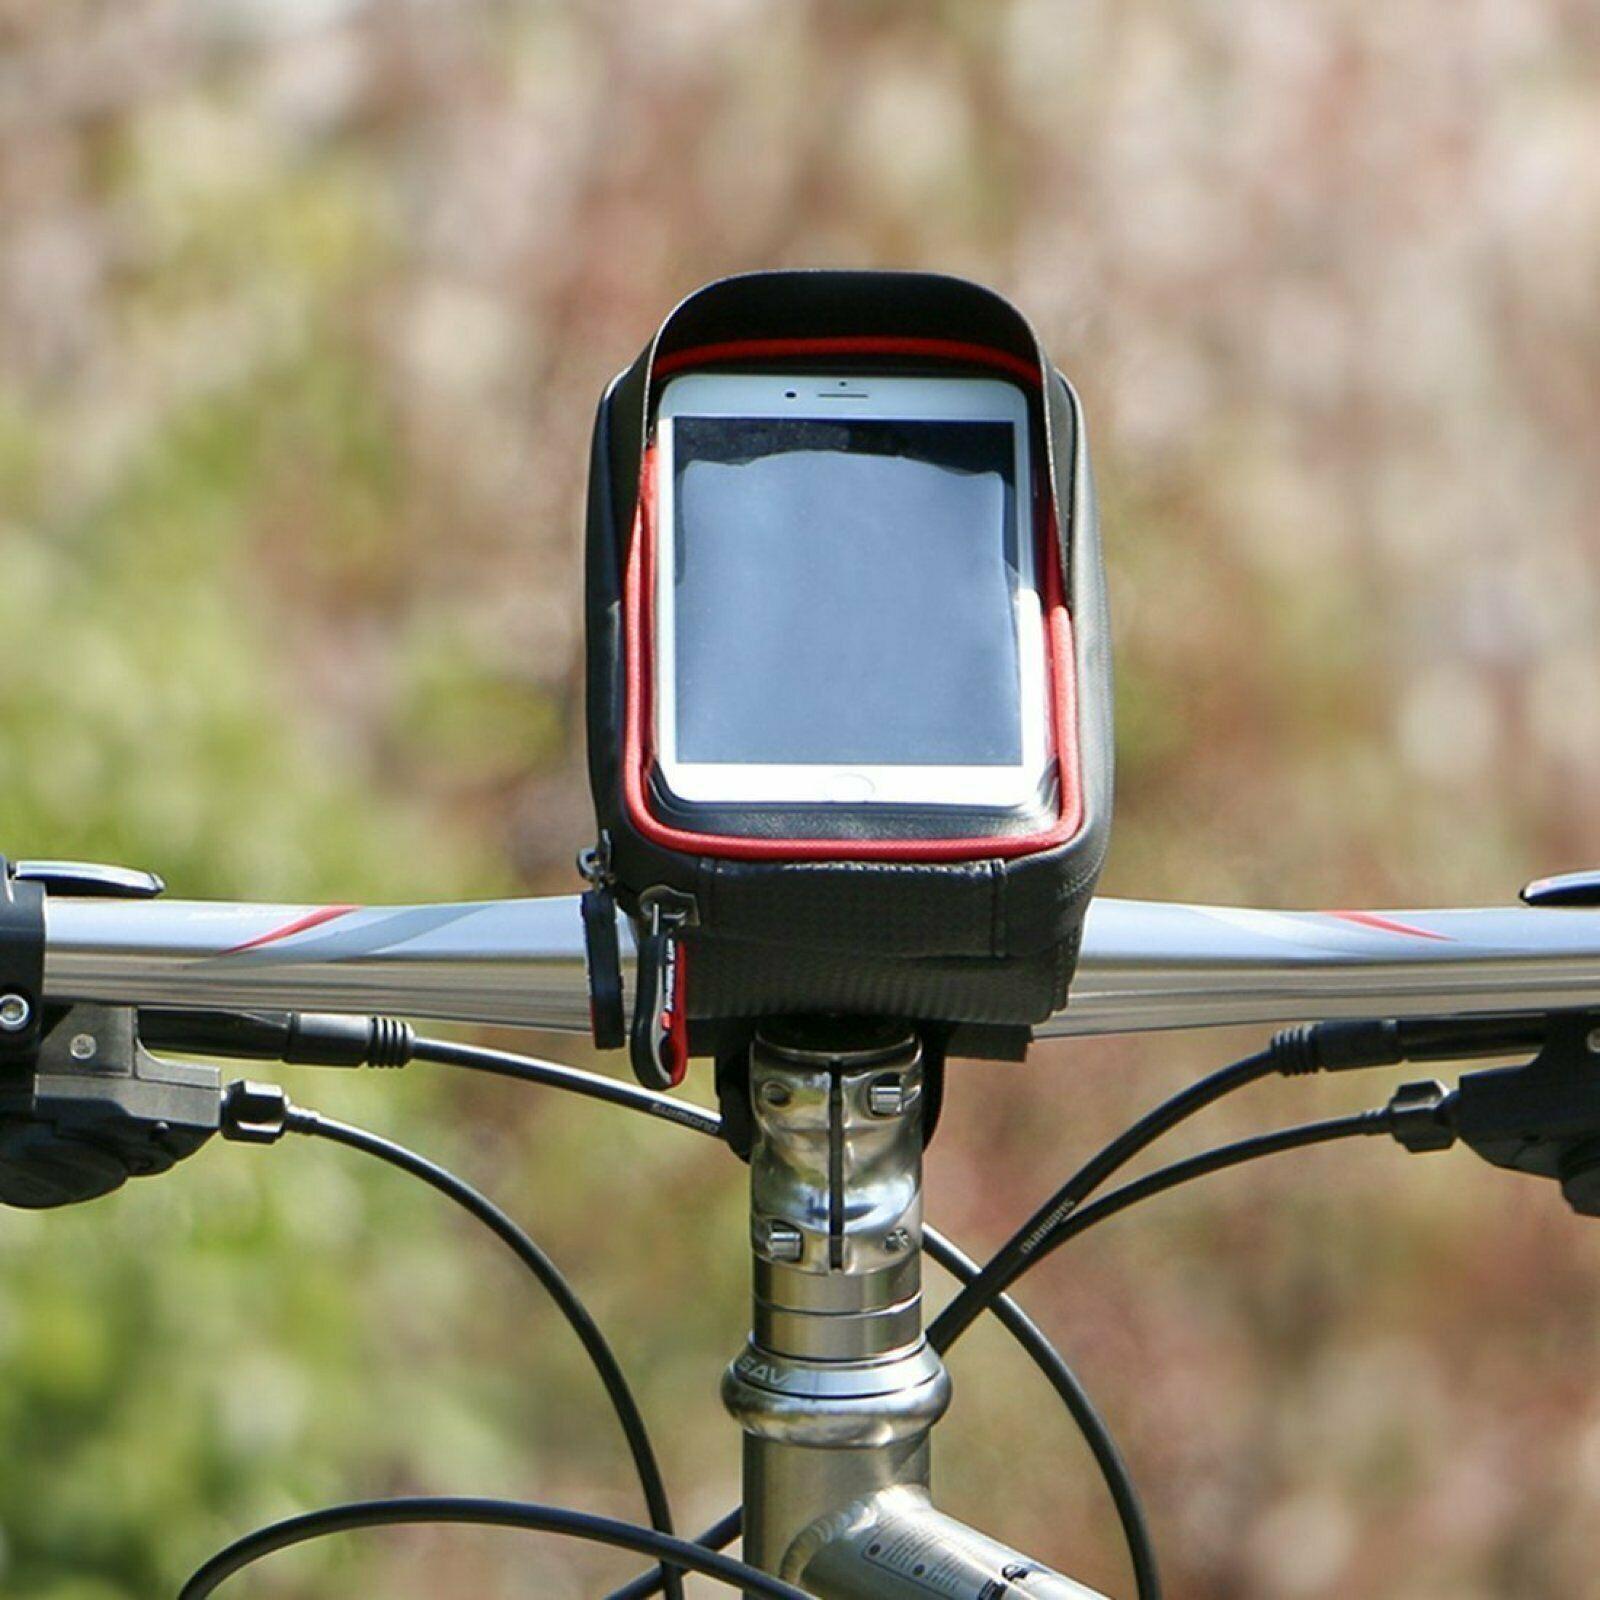 Xphonew Bike Handlebar Bag Bicycle Phone Mount Waterproof